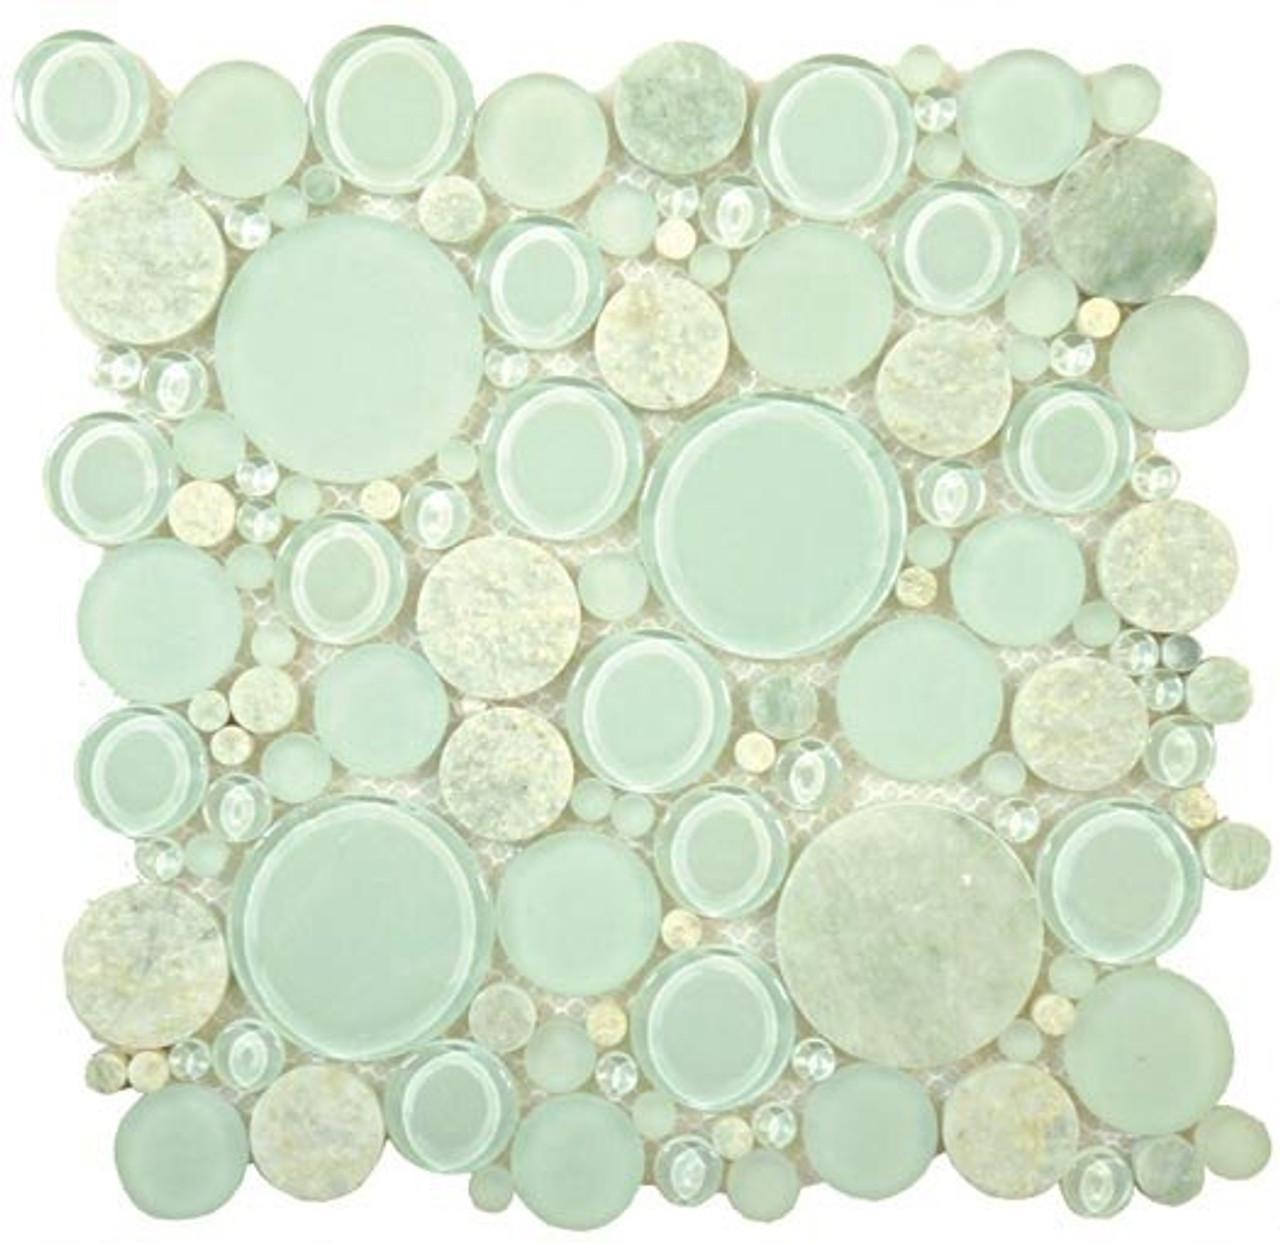 Bella Glass Tiles Bubble Series Random Circles Moonstone